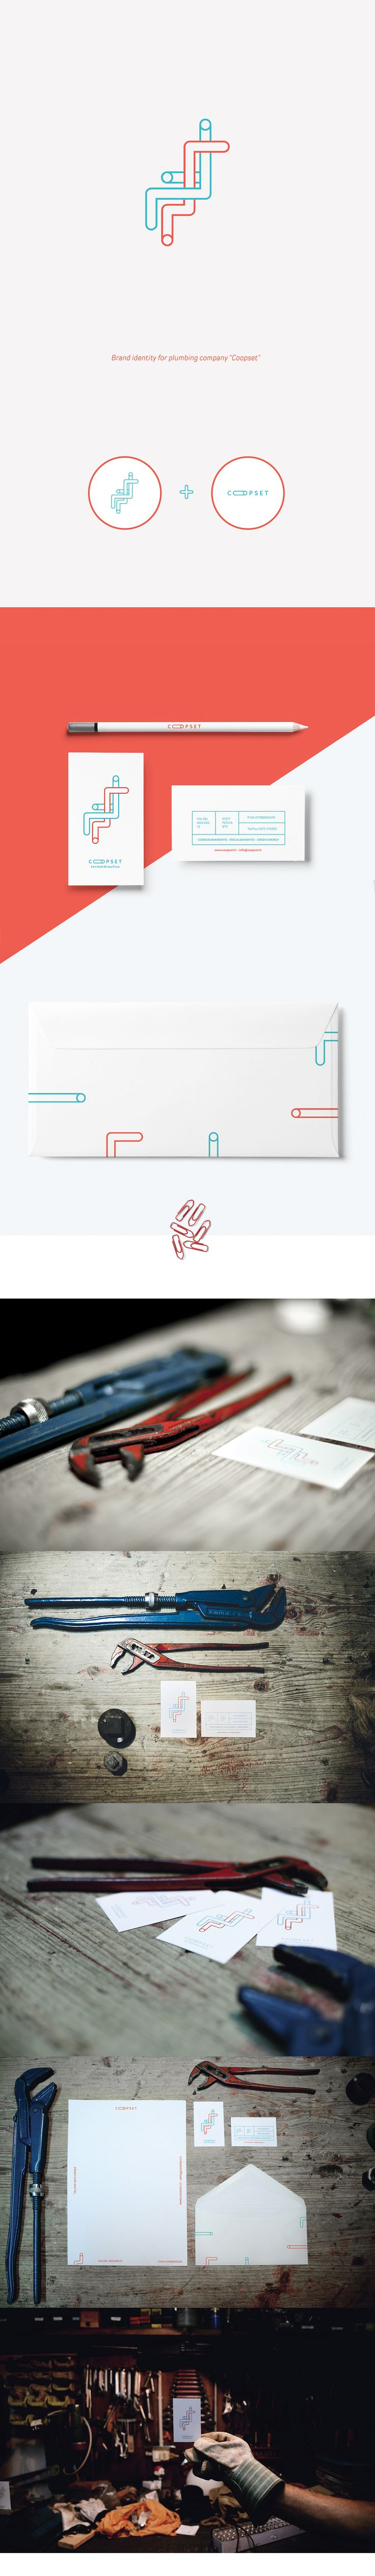 Best 25  Plumbing companies ideas on Pinterest | Clogged sink ...